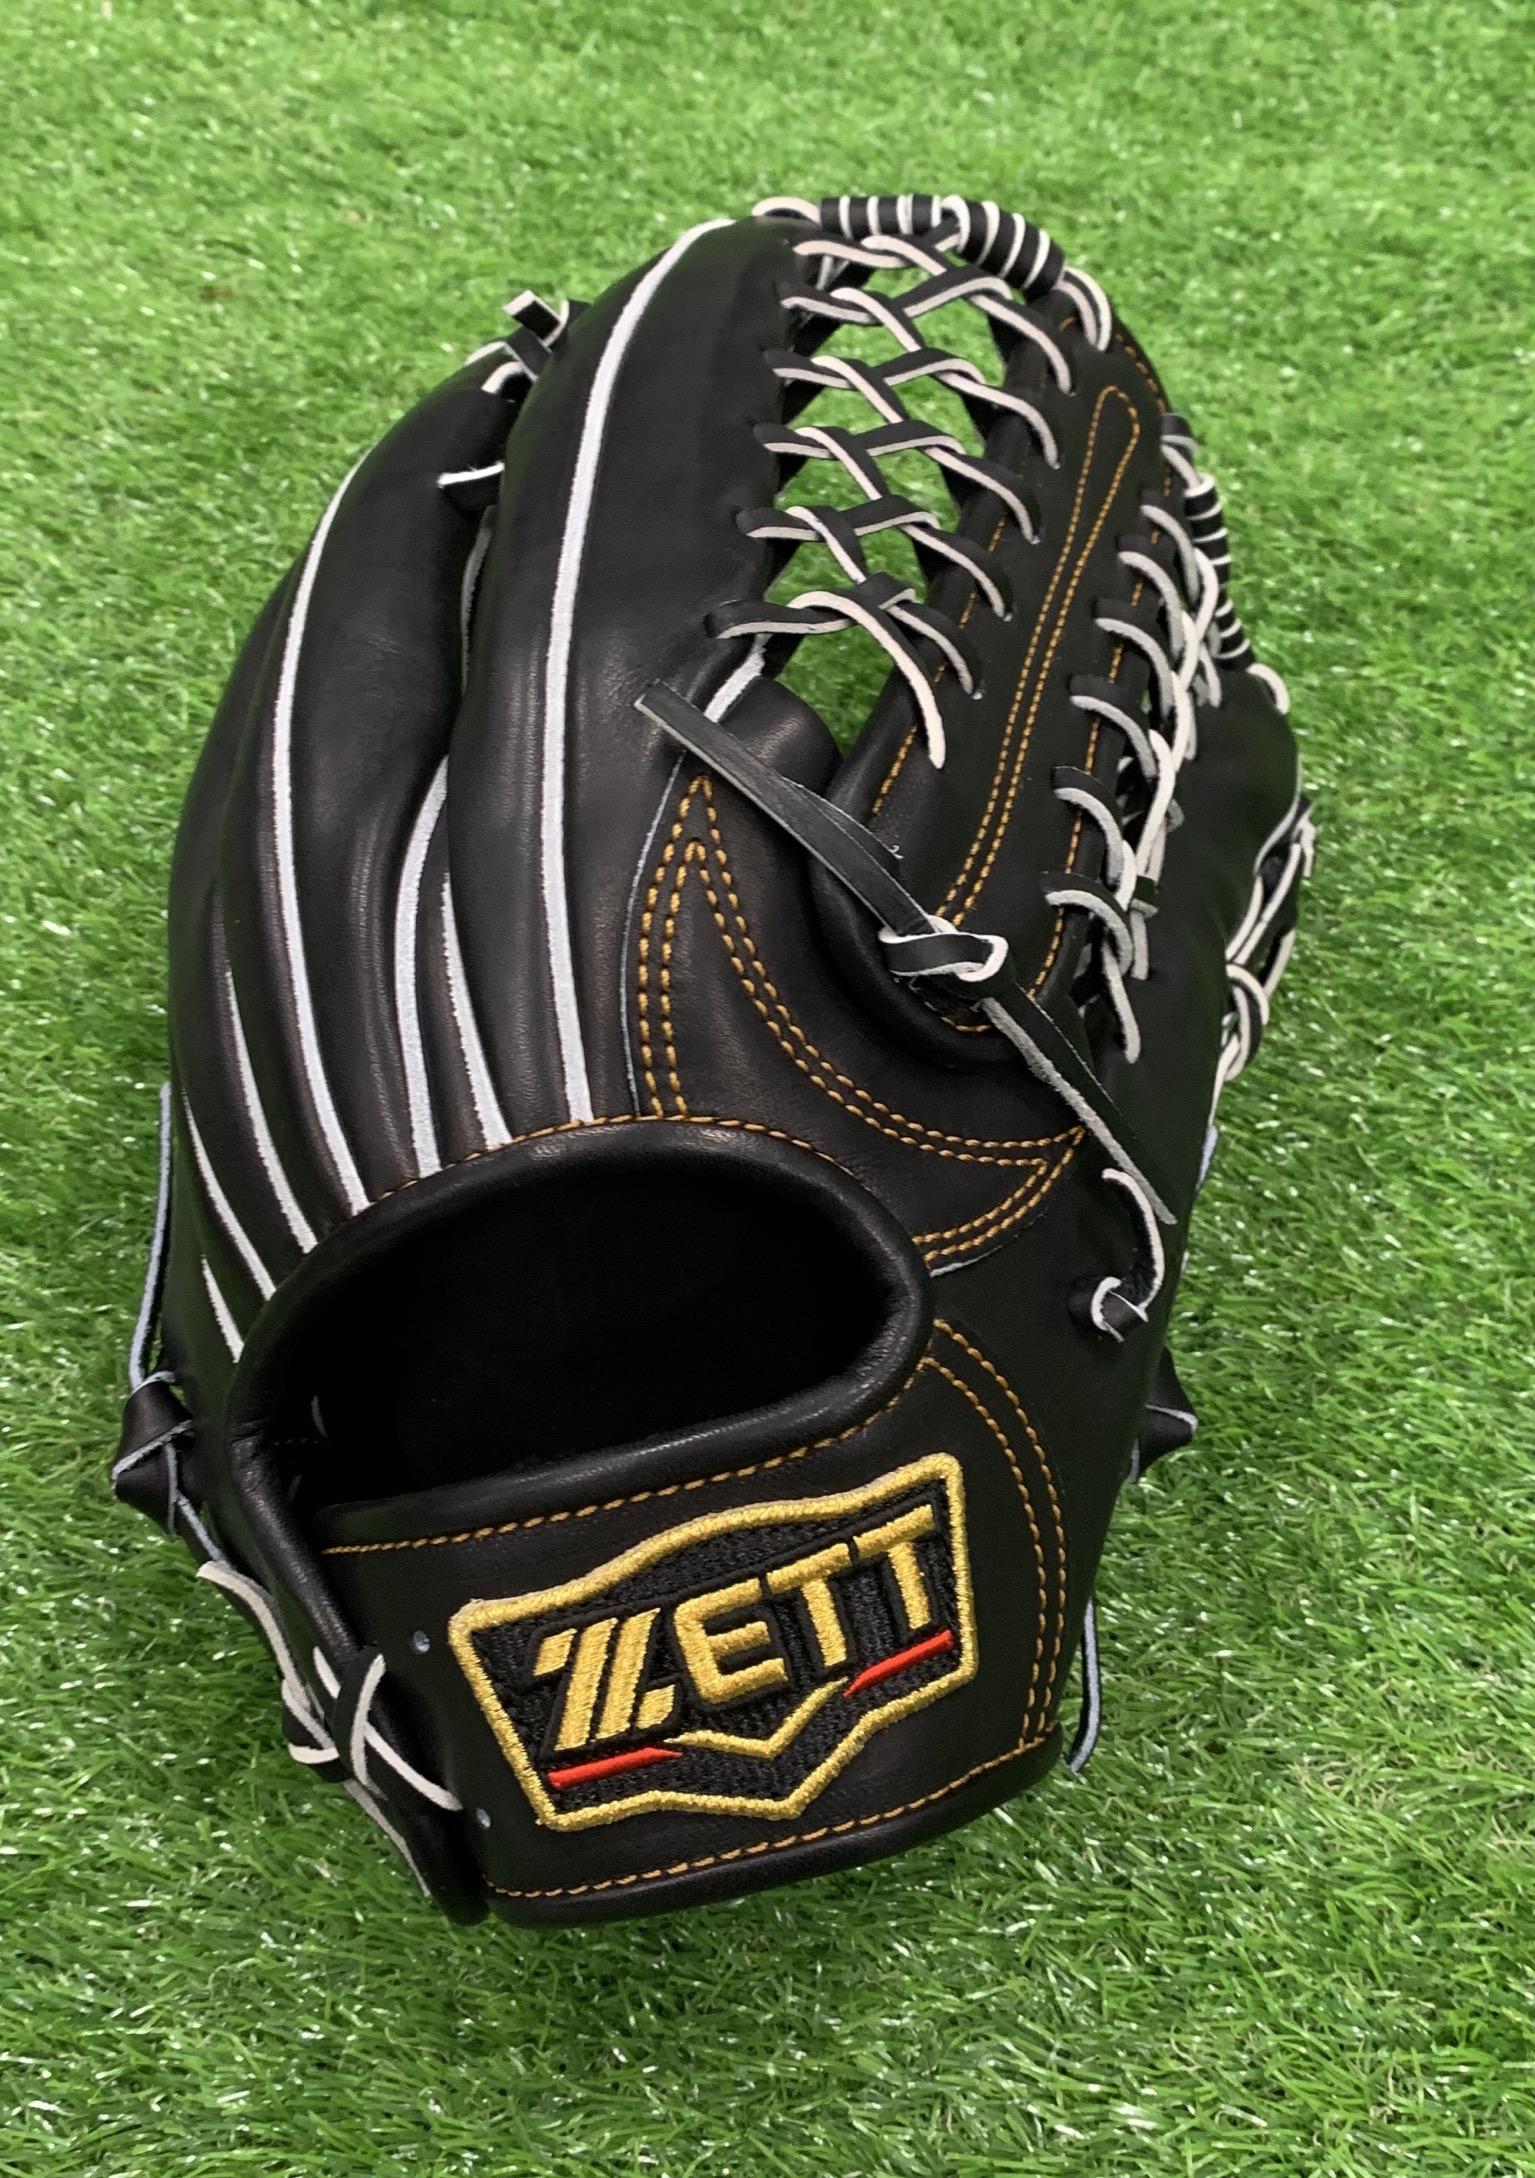 ZETT/ゼット プロステイタス 硬式用グラブ/右投げ 外野手用